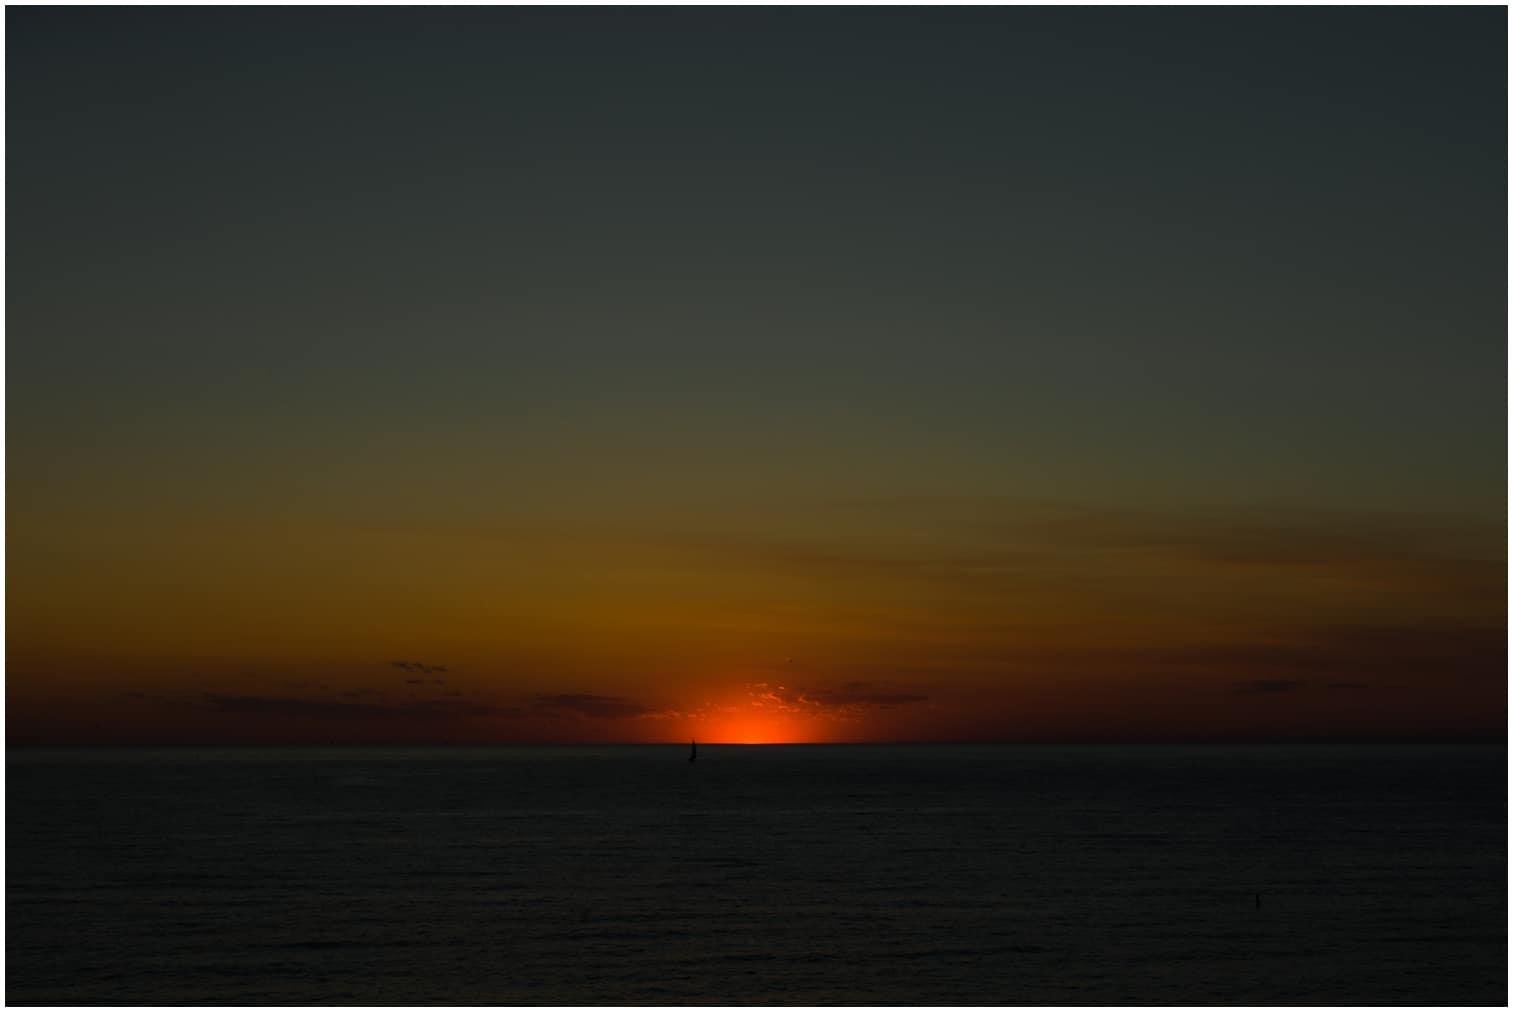 south haven, michigan, sunset, adam lowe photography, travel photography, landscape photography, Lake Michigan